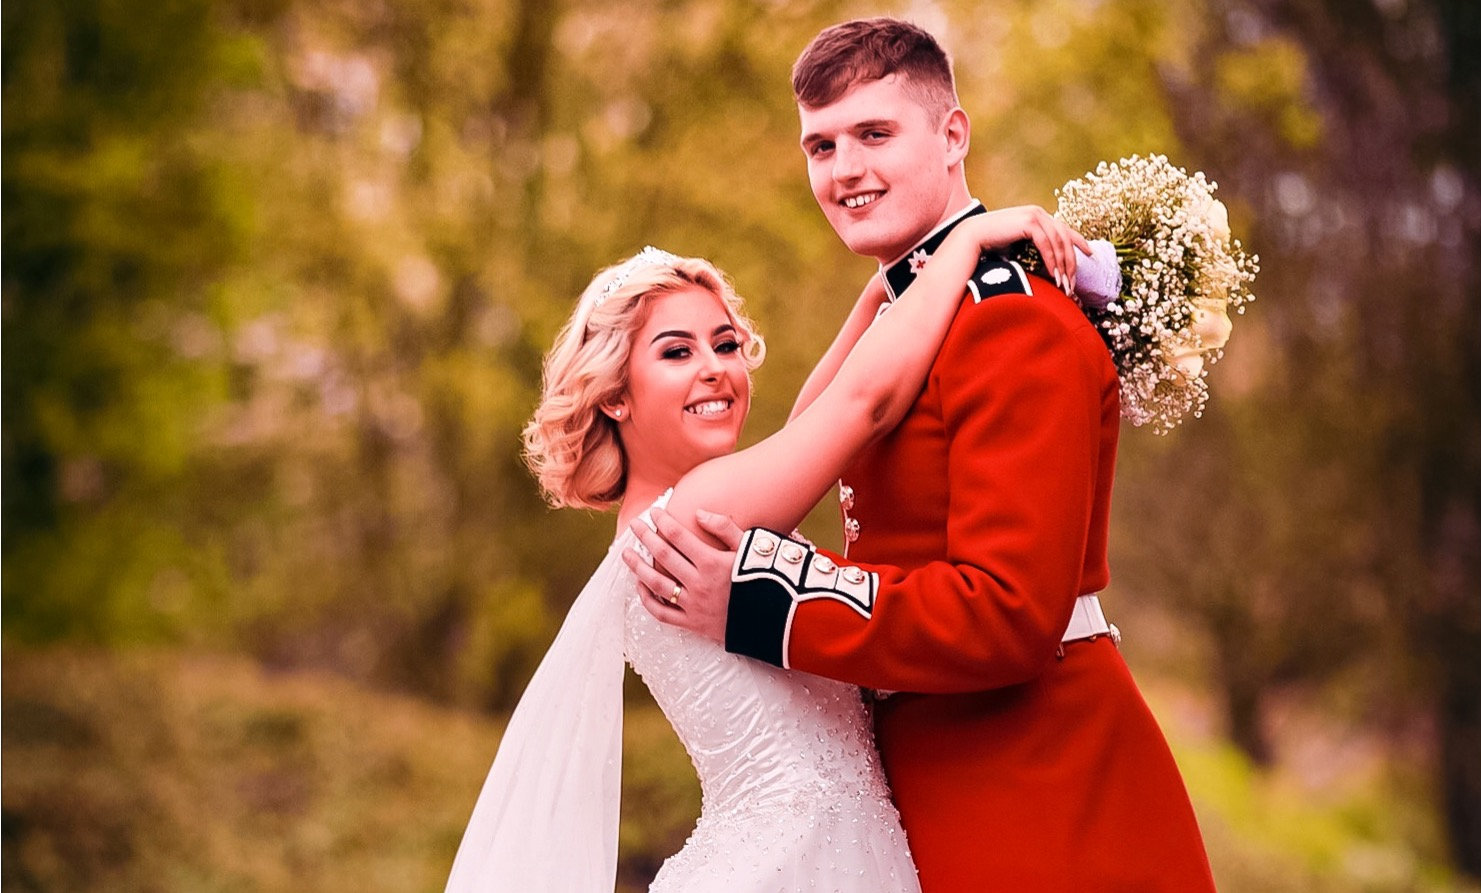 Bridge & groom pose for photographs